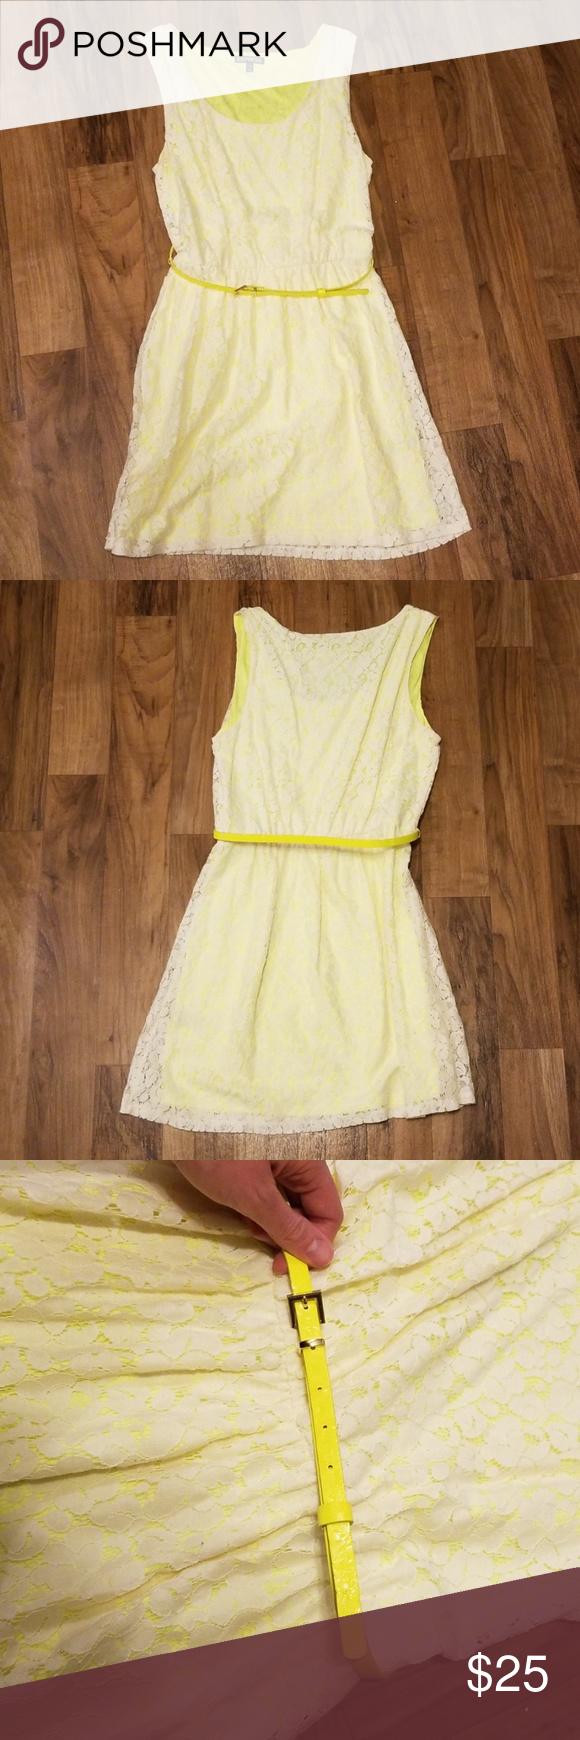 Express Yellow With White Lace Dress Lace White Dress Fashion Clothes Design [ 1740 x 580 Pixel ]